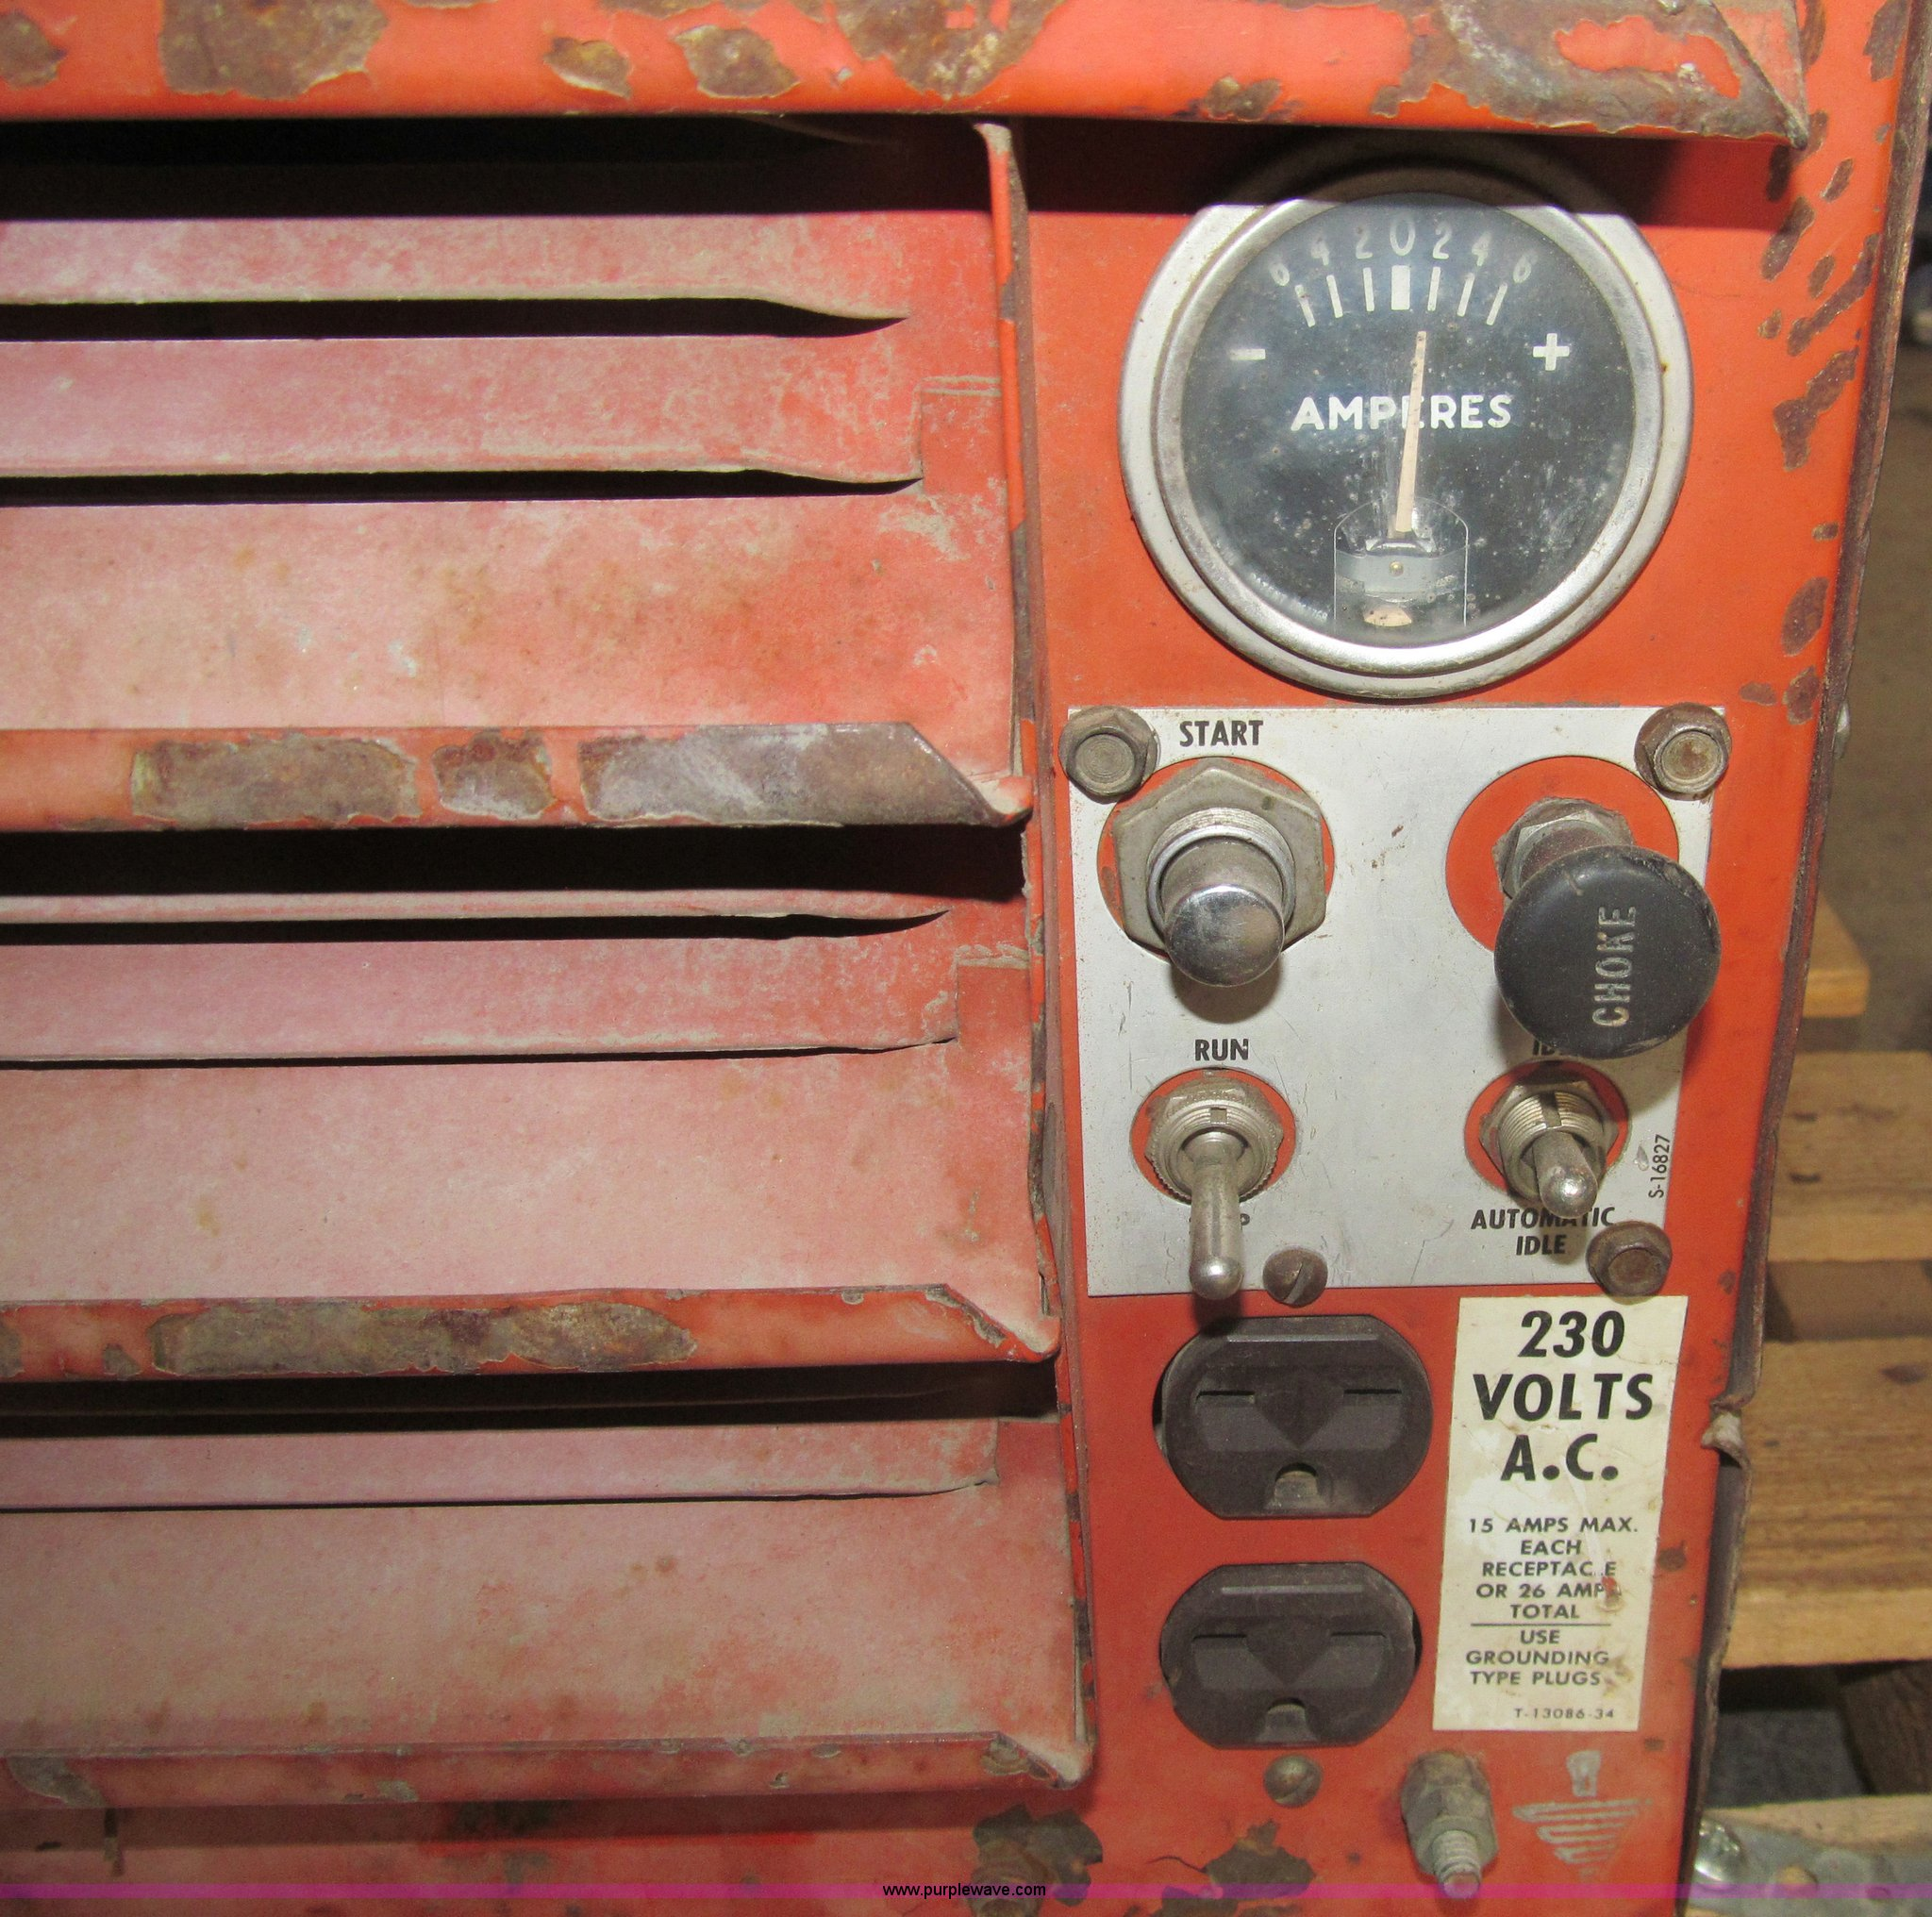 Lincoln Weldanpower AC DC welder Item I7230